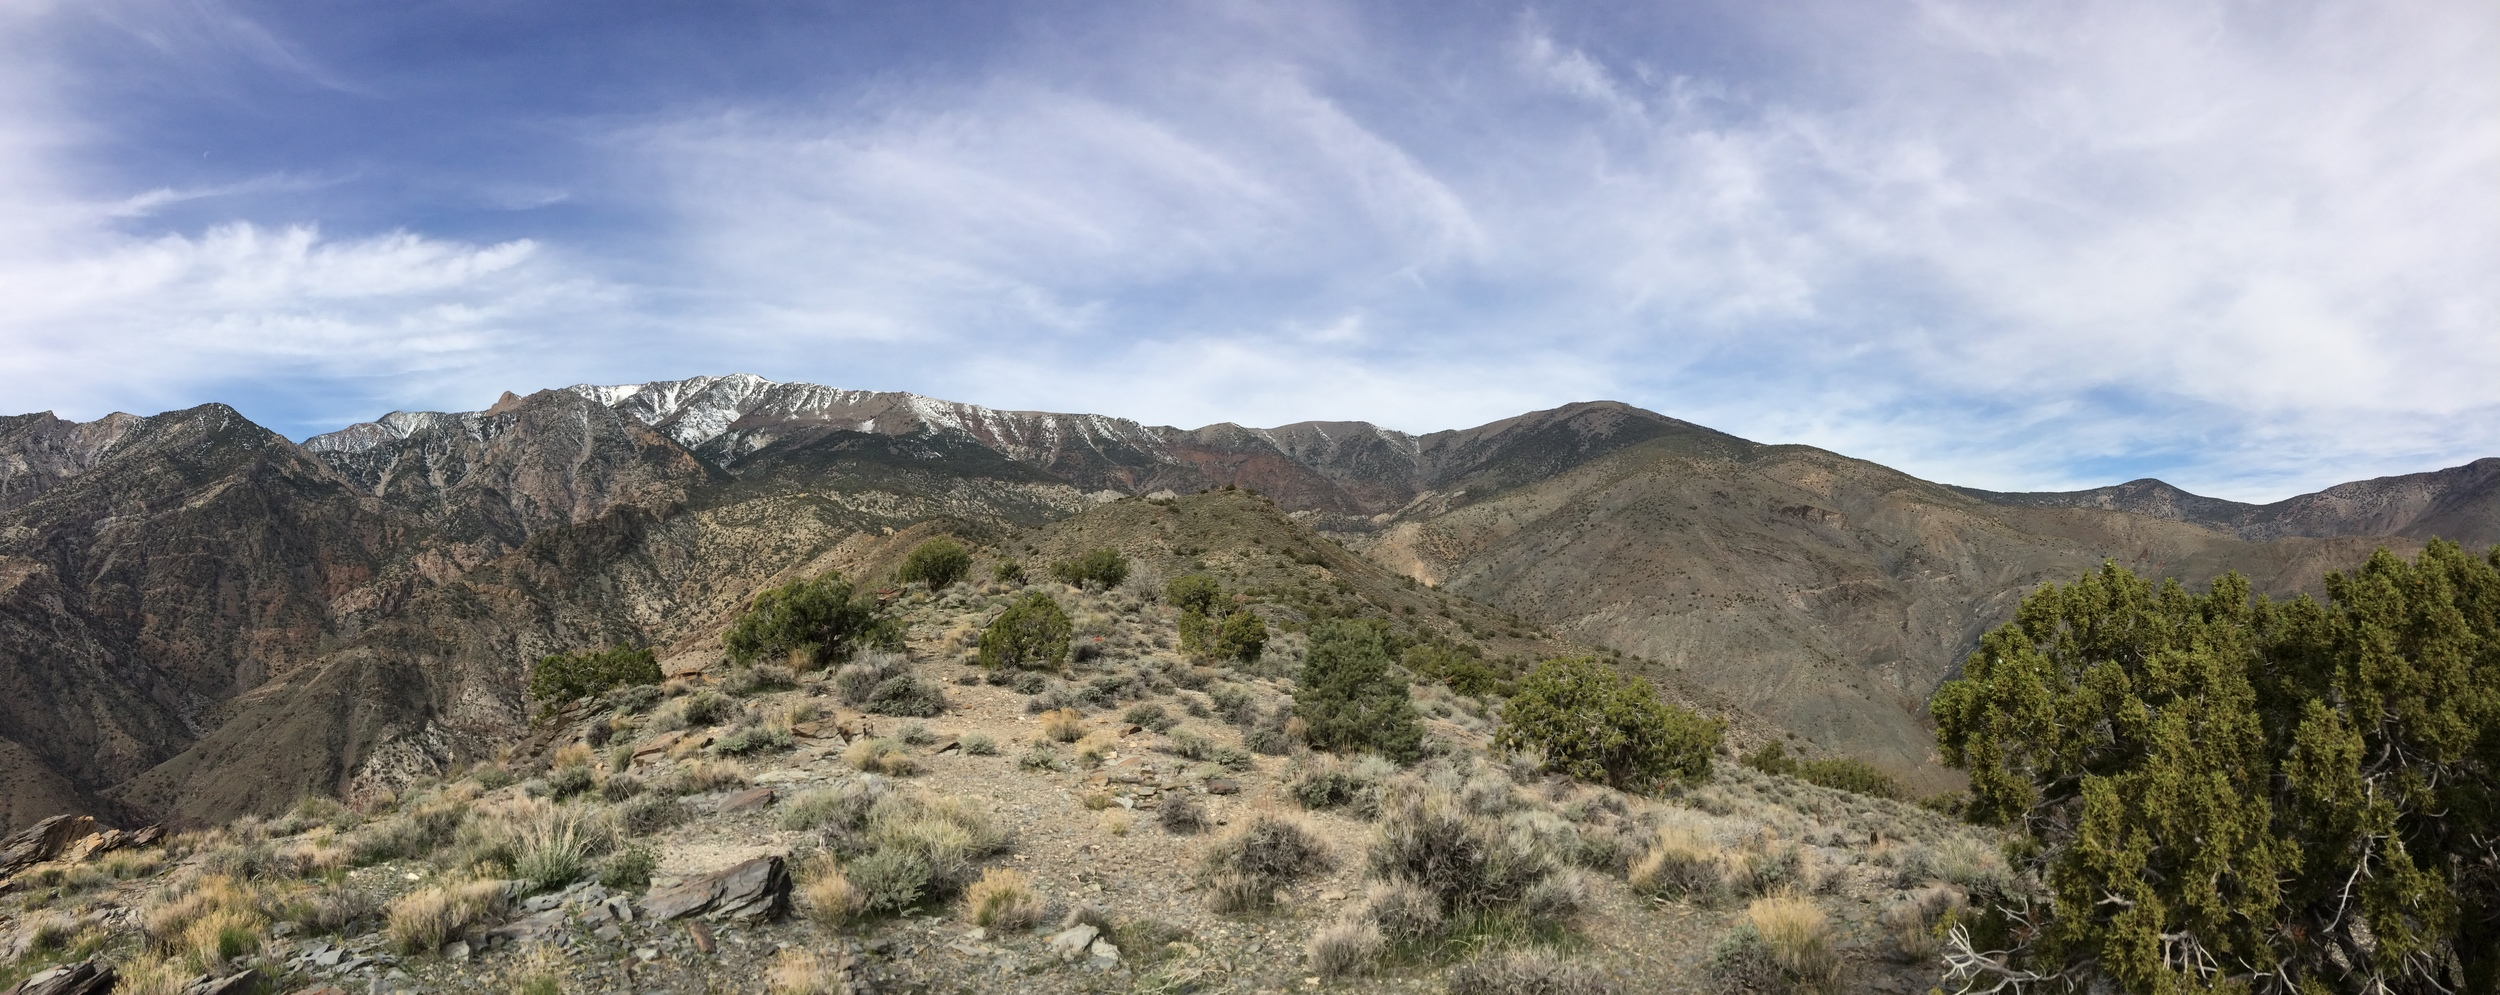 Ascending along the ridgeline toward Telescope Peak along the Shorty's Well Route, March 2015